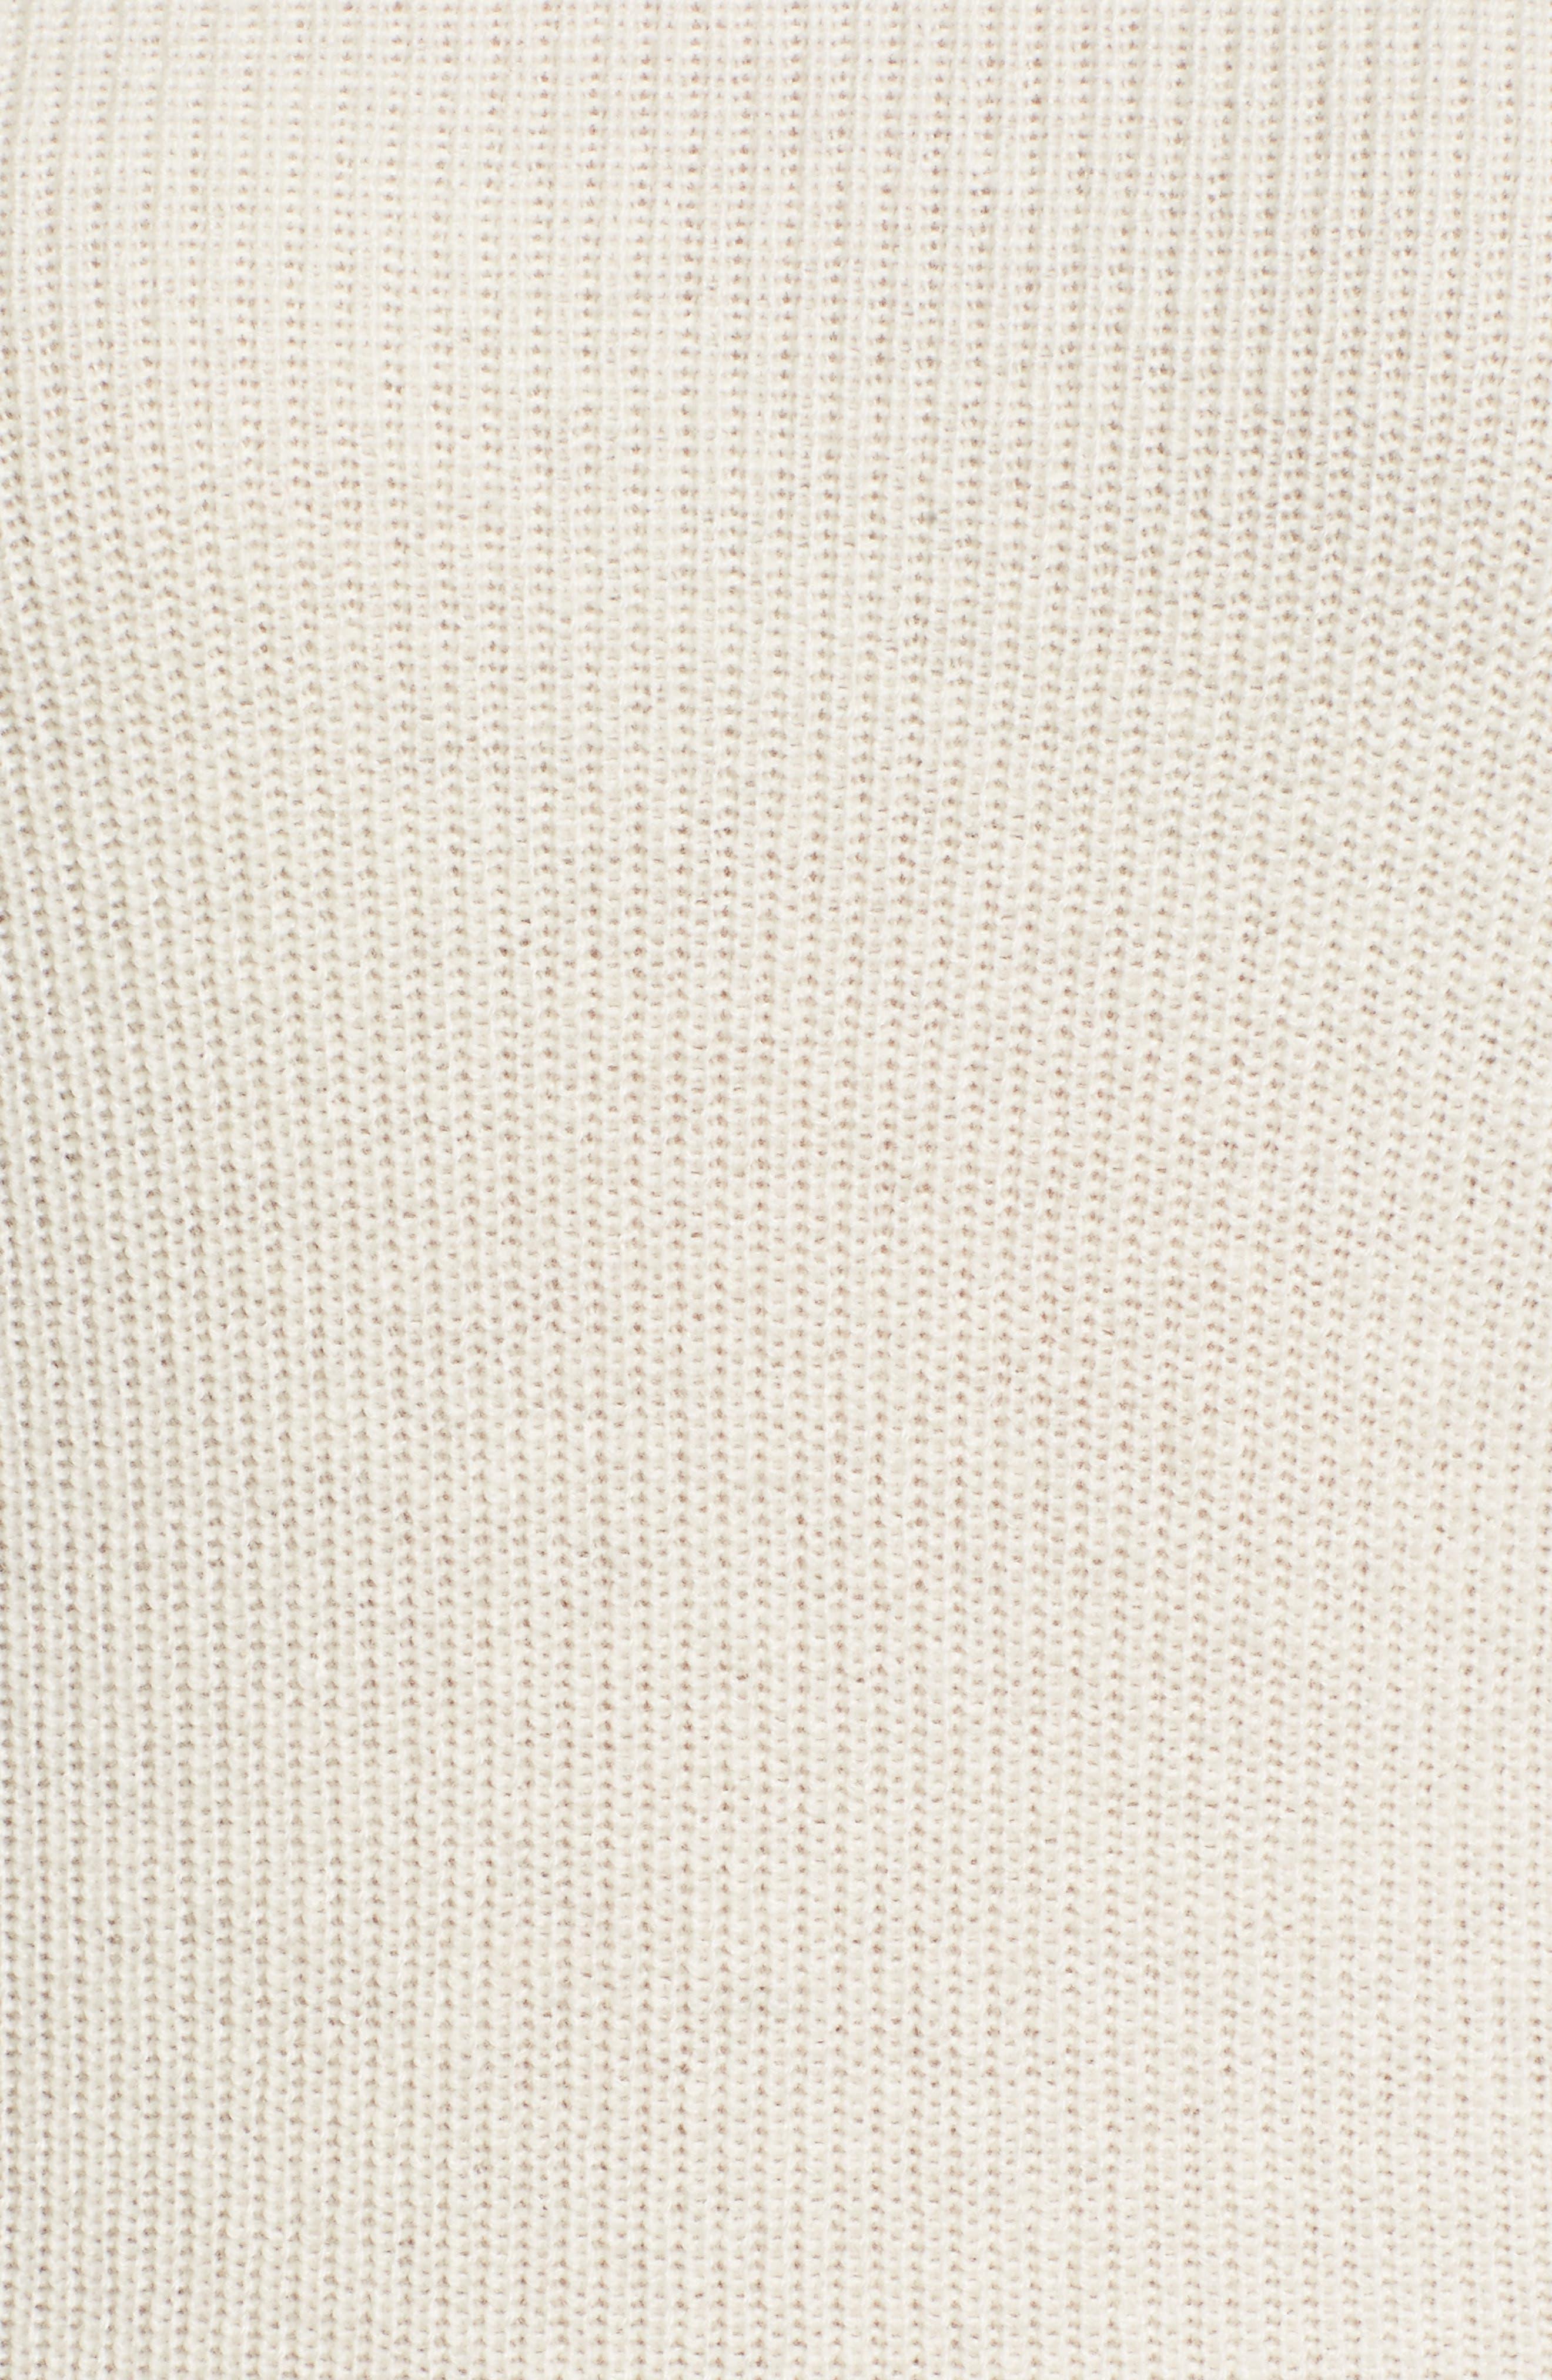 Cold Shoulder Cashmere Sweater,                             Alternate thumbnail 5, color,                             905